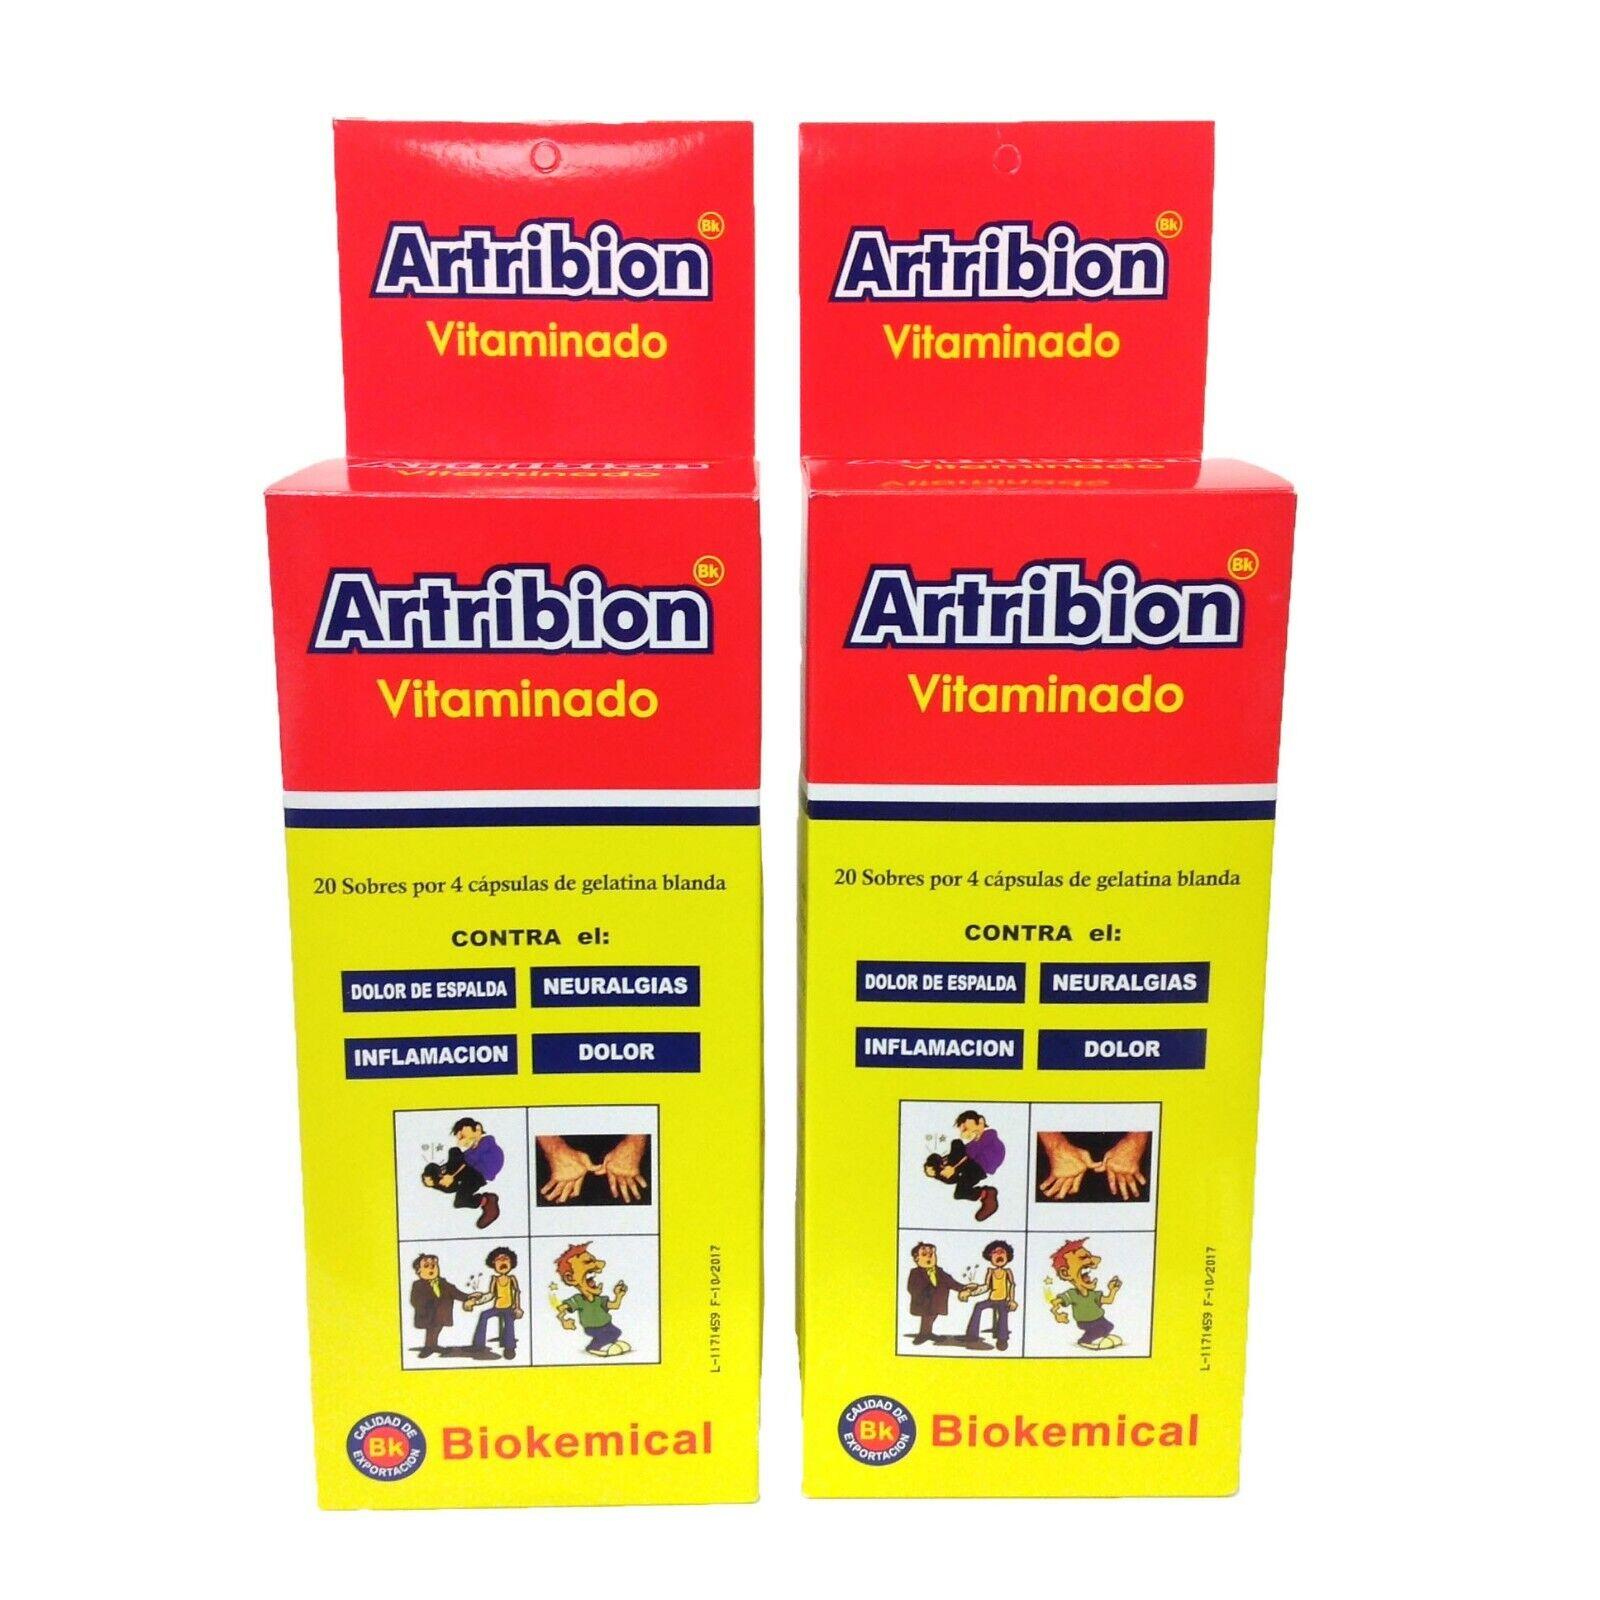 2 ARTRIBION VITAMINADO 2 DISPLAY 20 Packs x 4 Pills each one *** ORIGINAL***